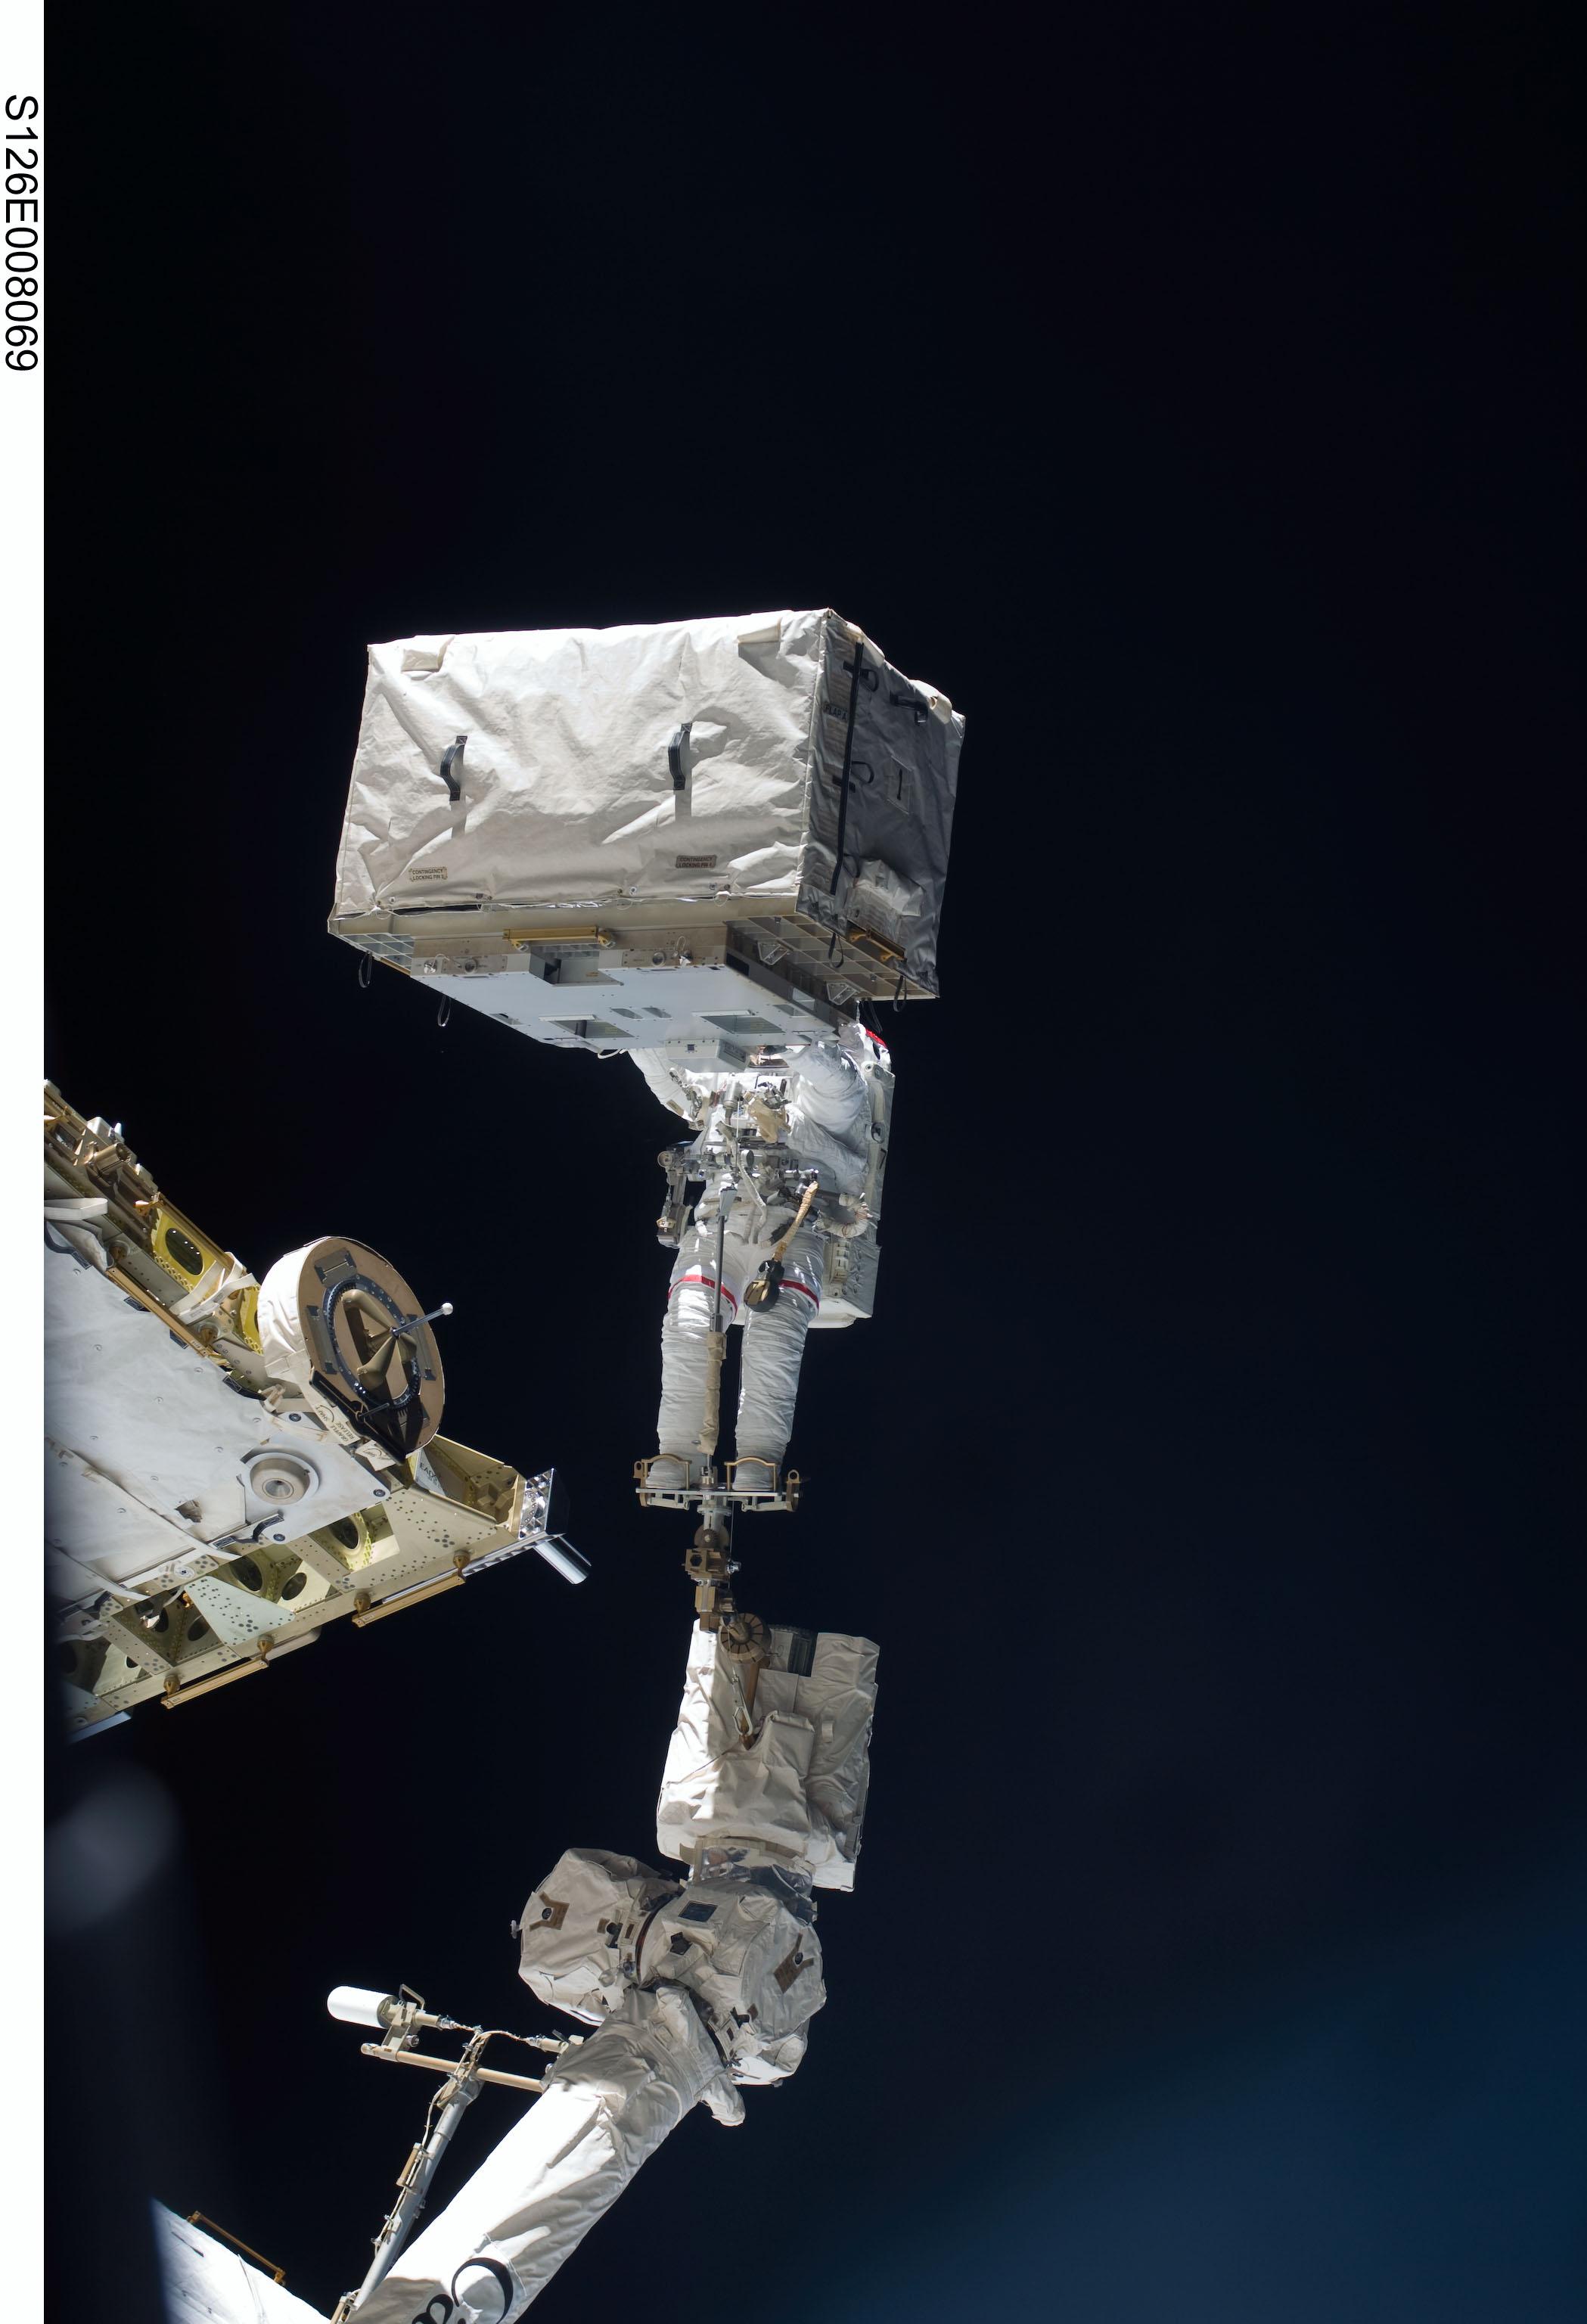 Space - Astronaut's Head Upgraded During Spacewalk   Alien ...